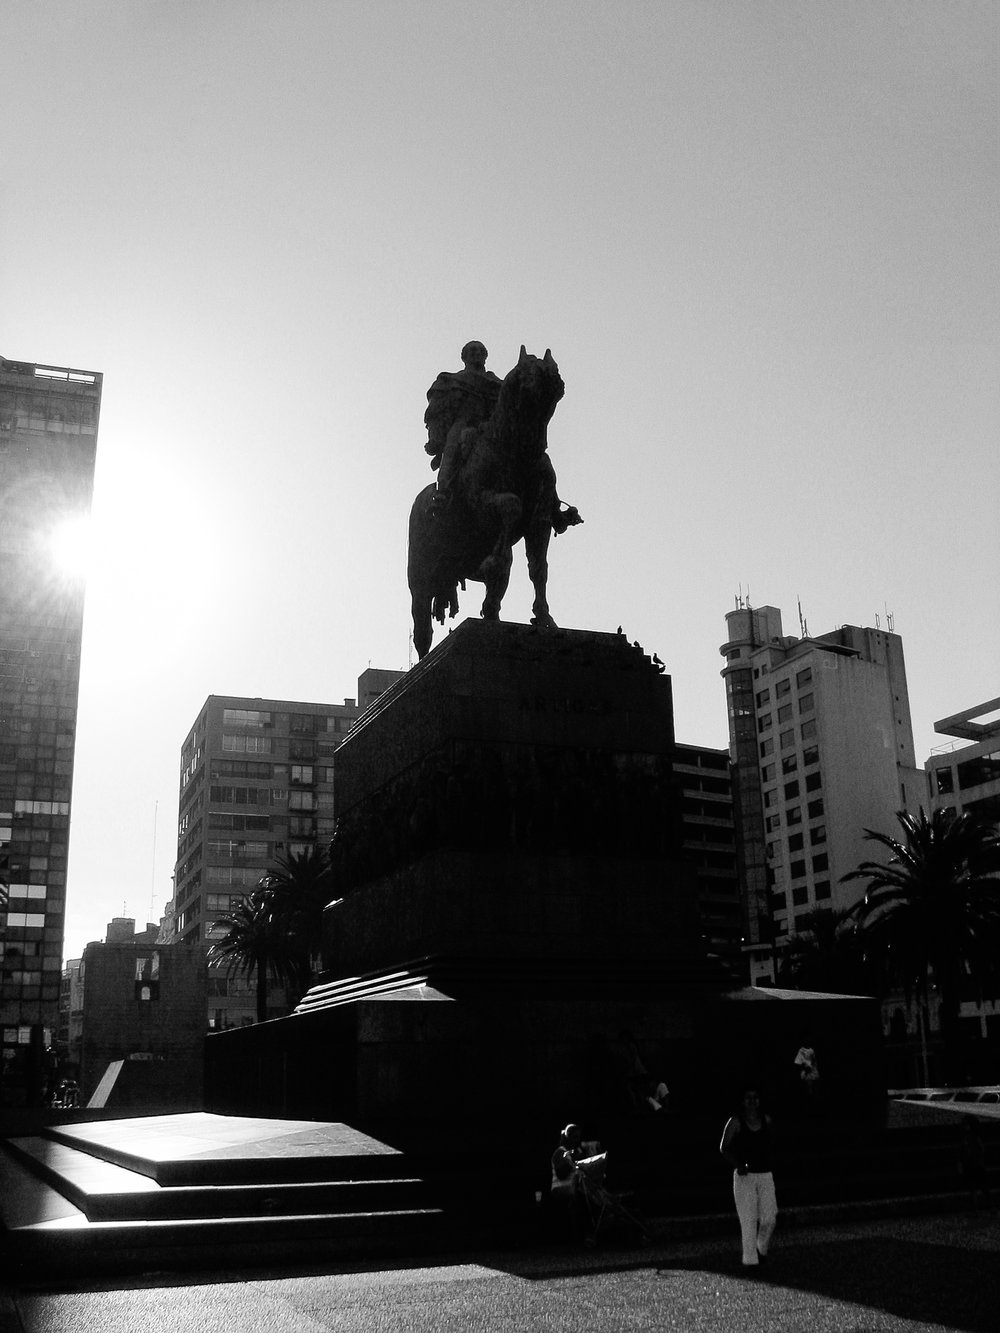 montevideo-6472-central-square-statue-of-statue-of-jose_artigas.jpg